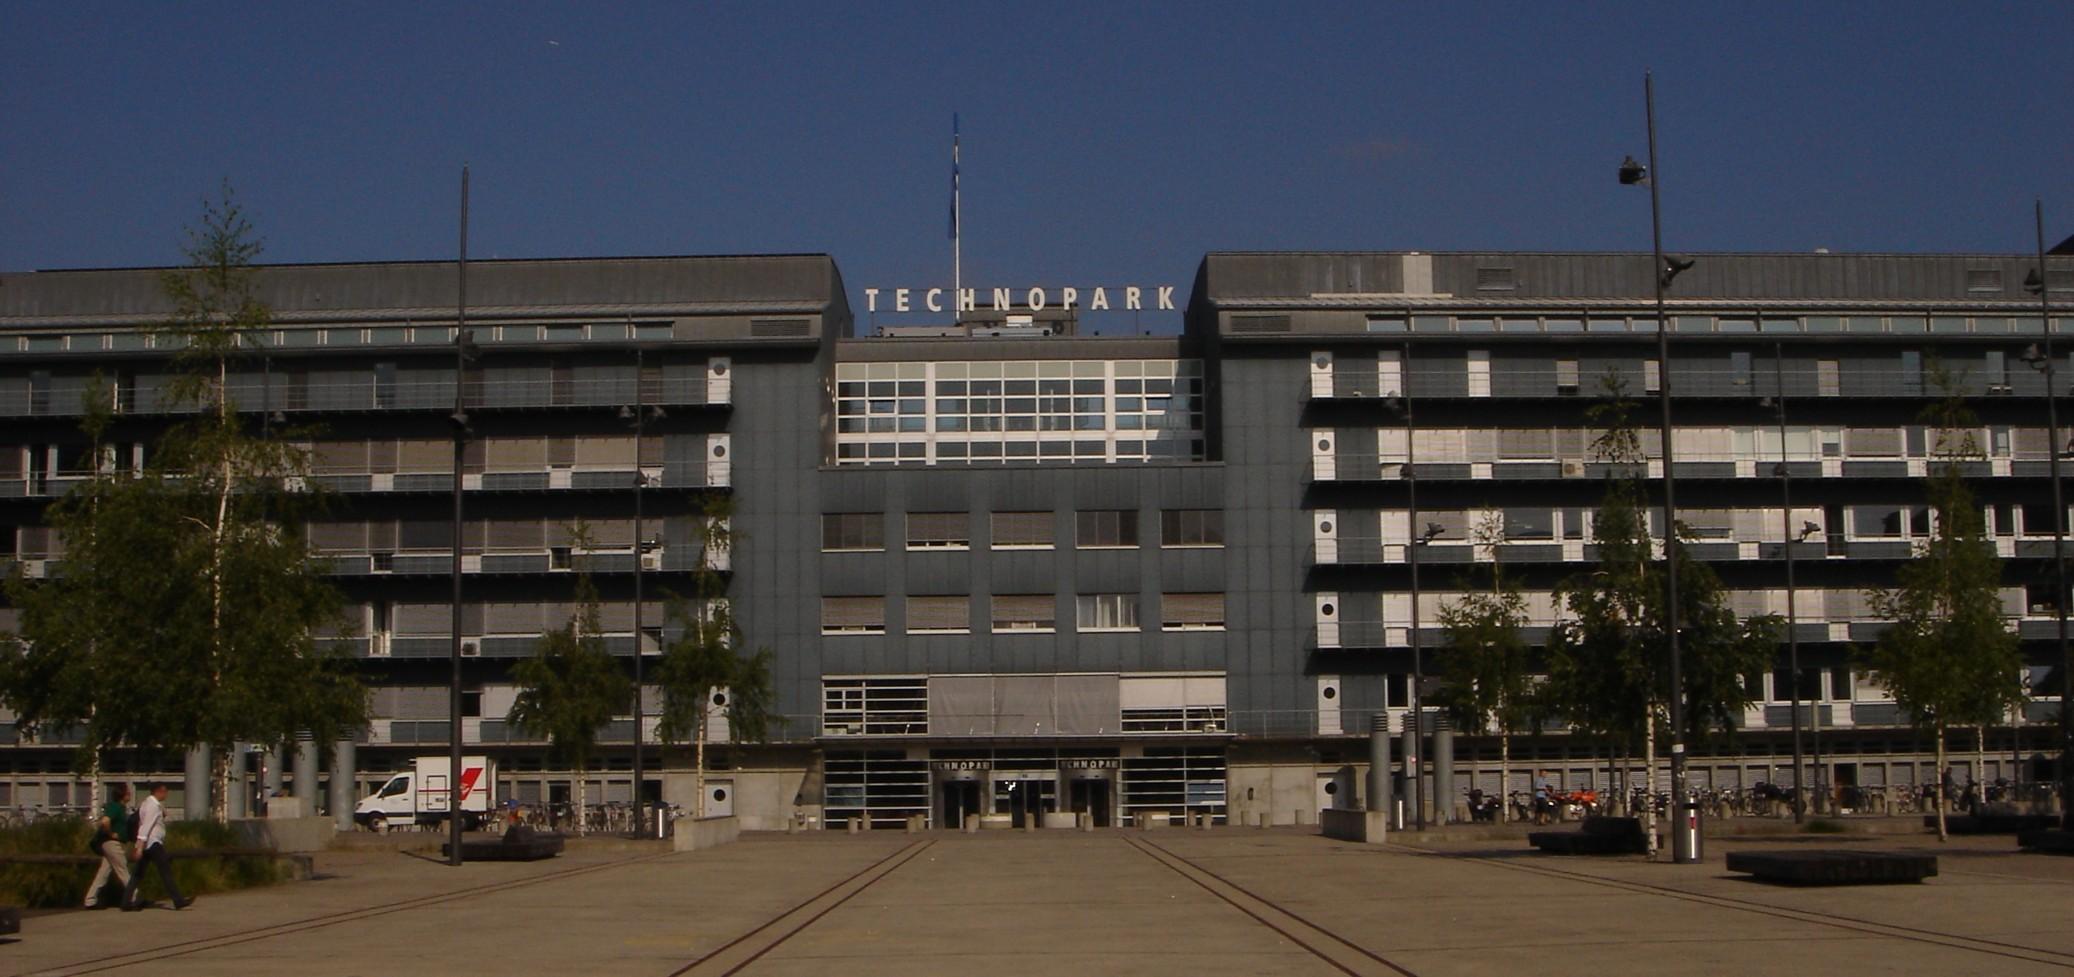 Gale - Technopark